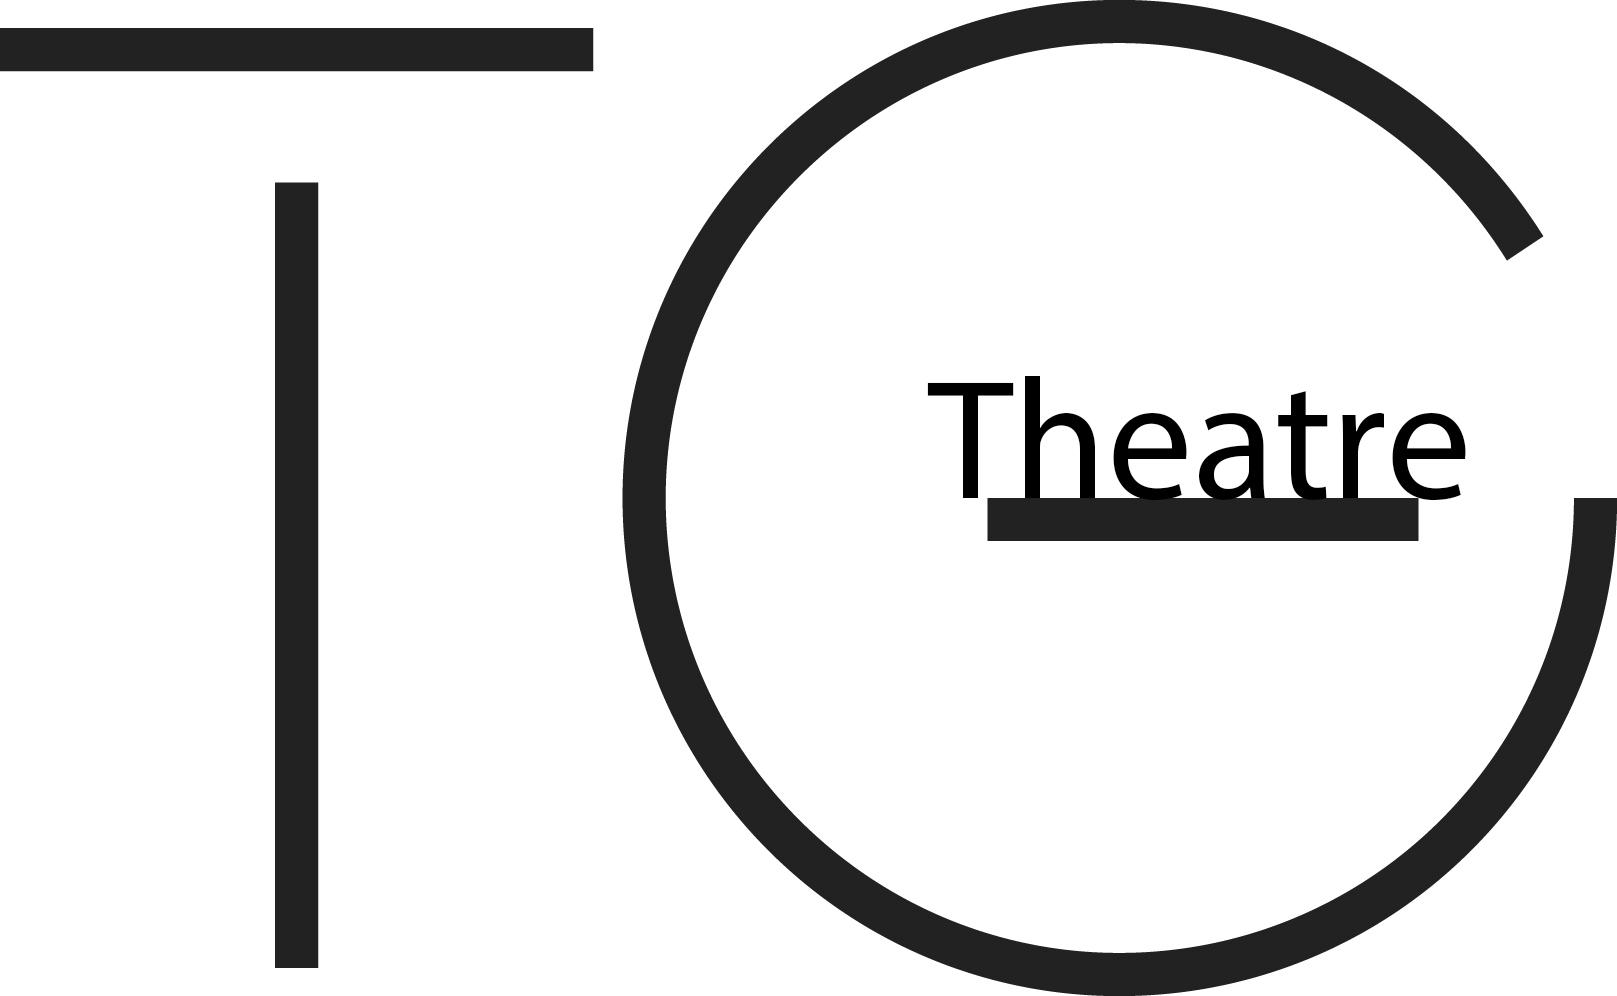 logotheatreTGscreen.jpg